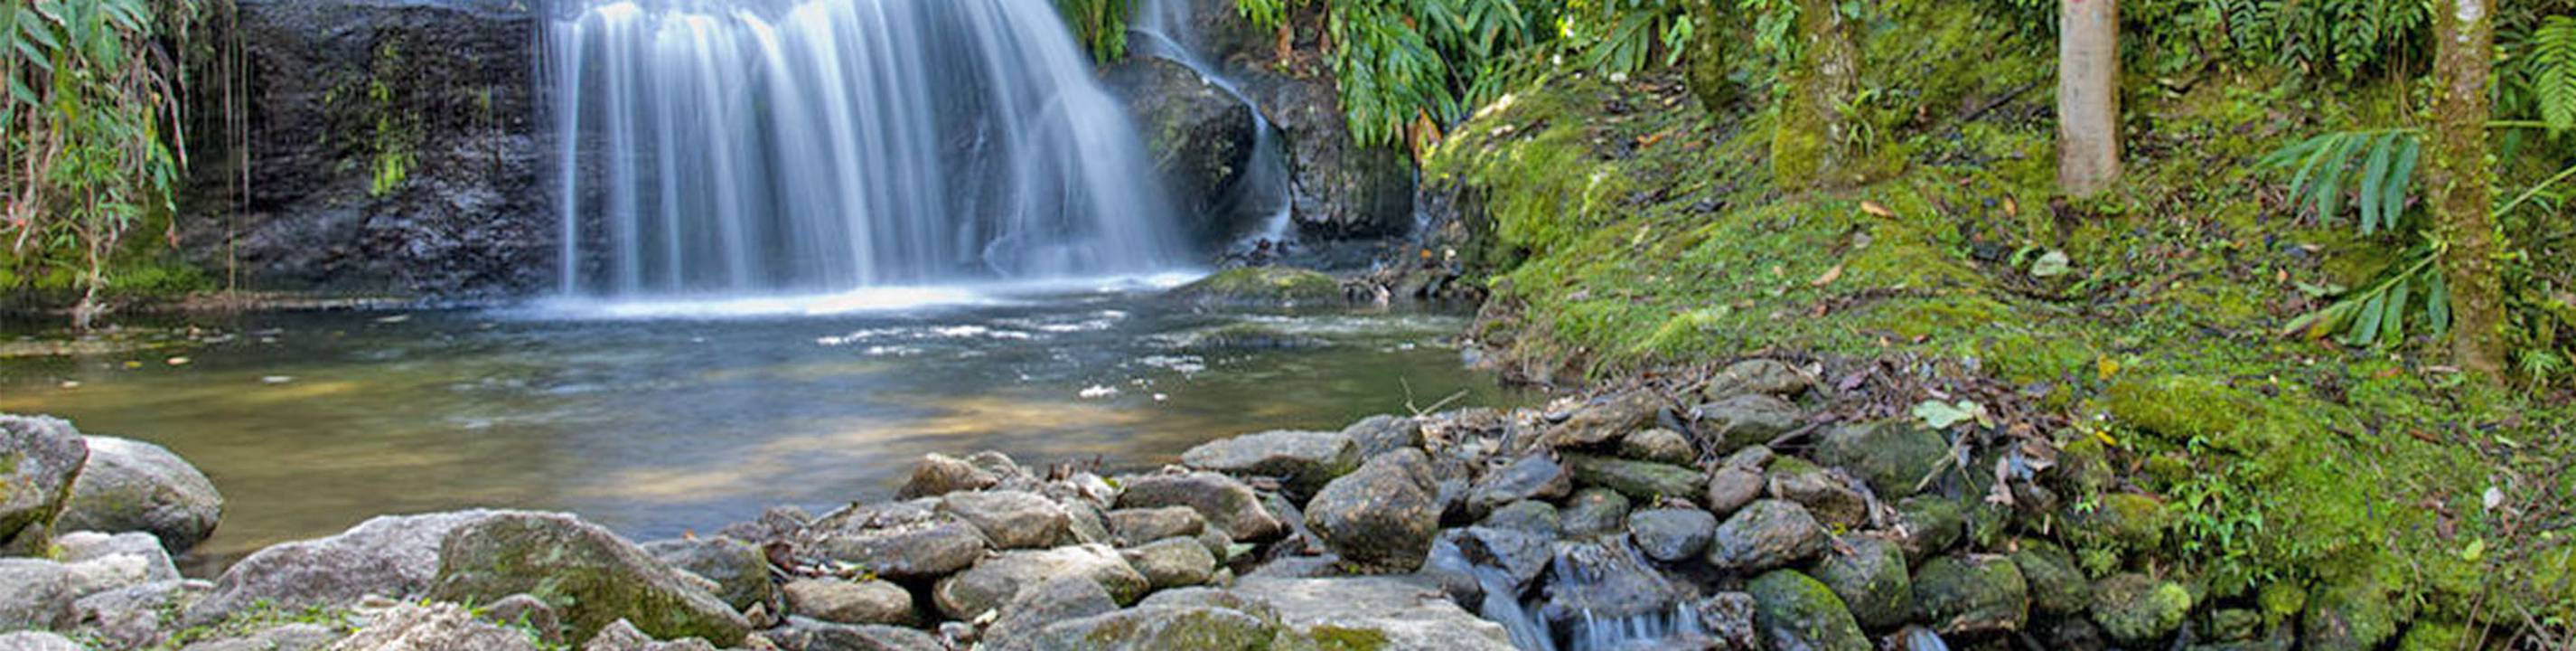 Pousada Bella Vista - Visconde de Mauá